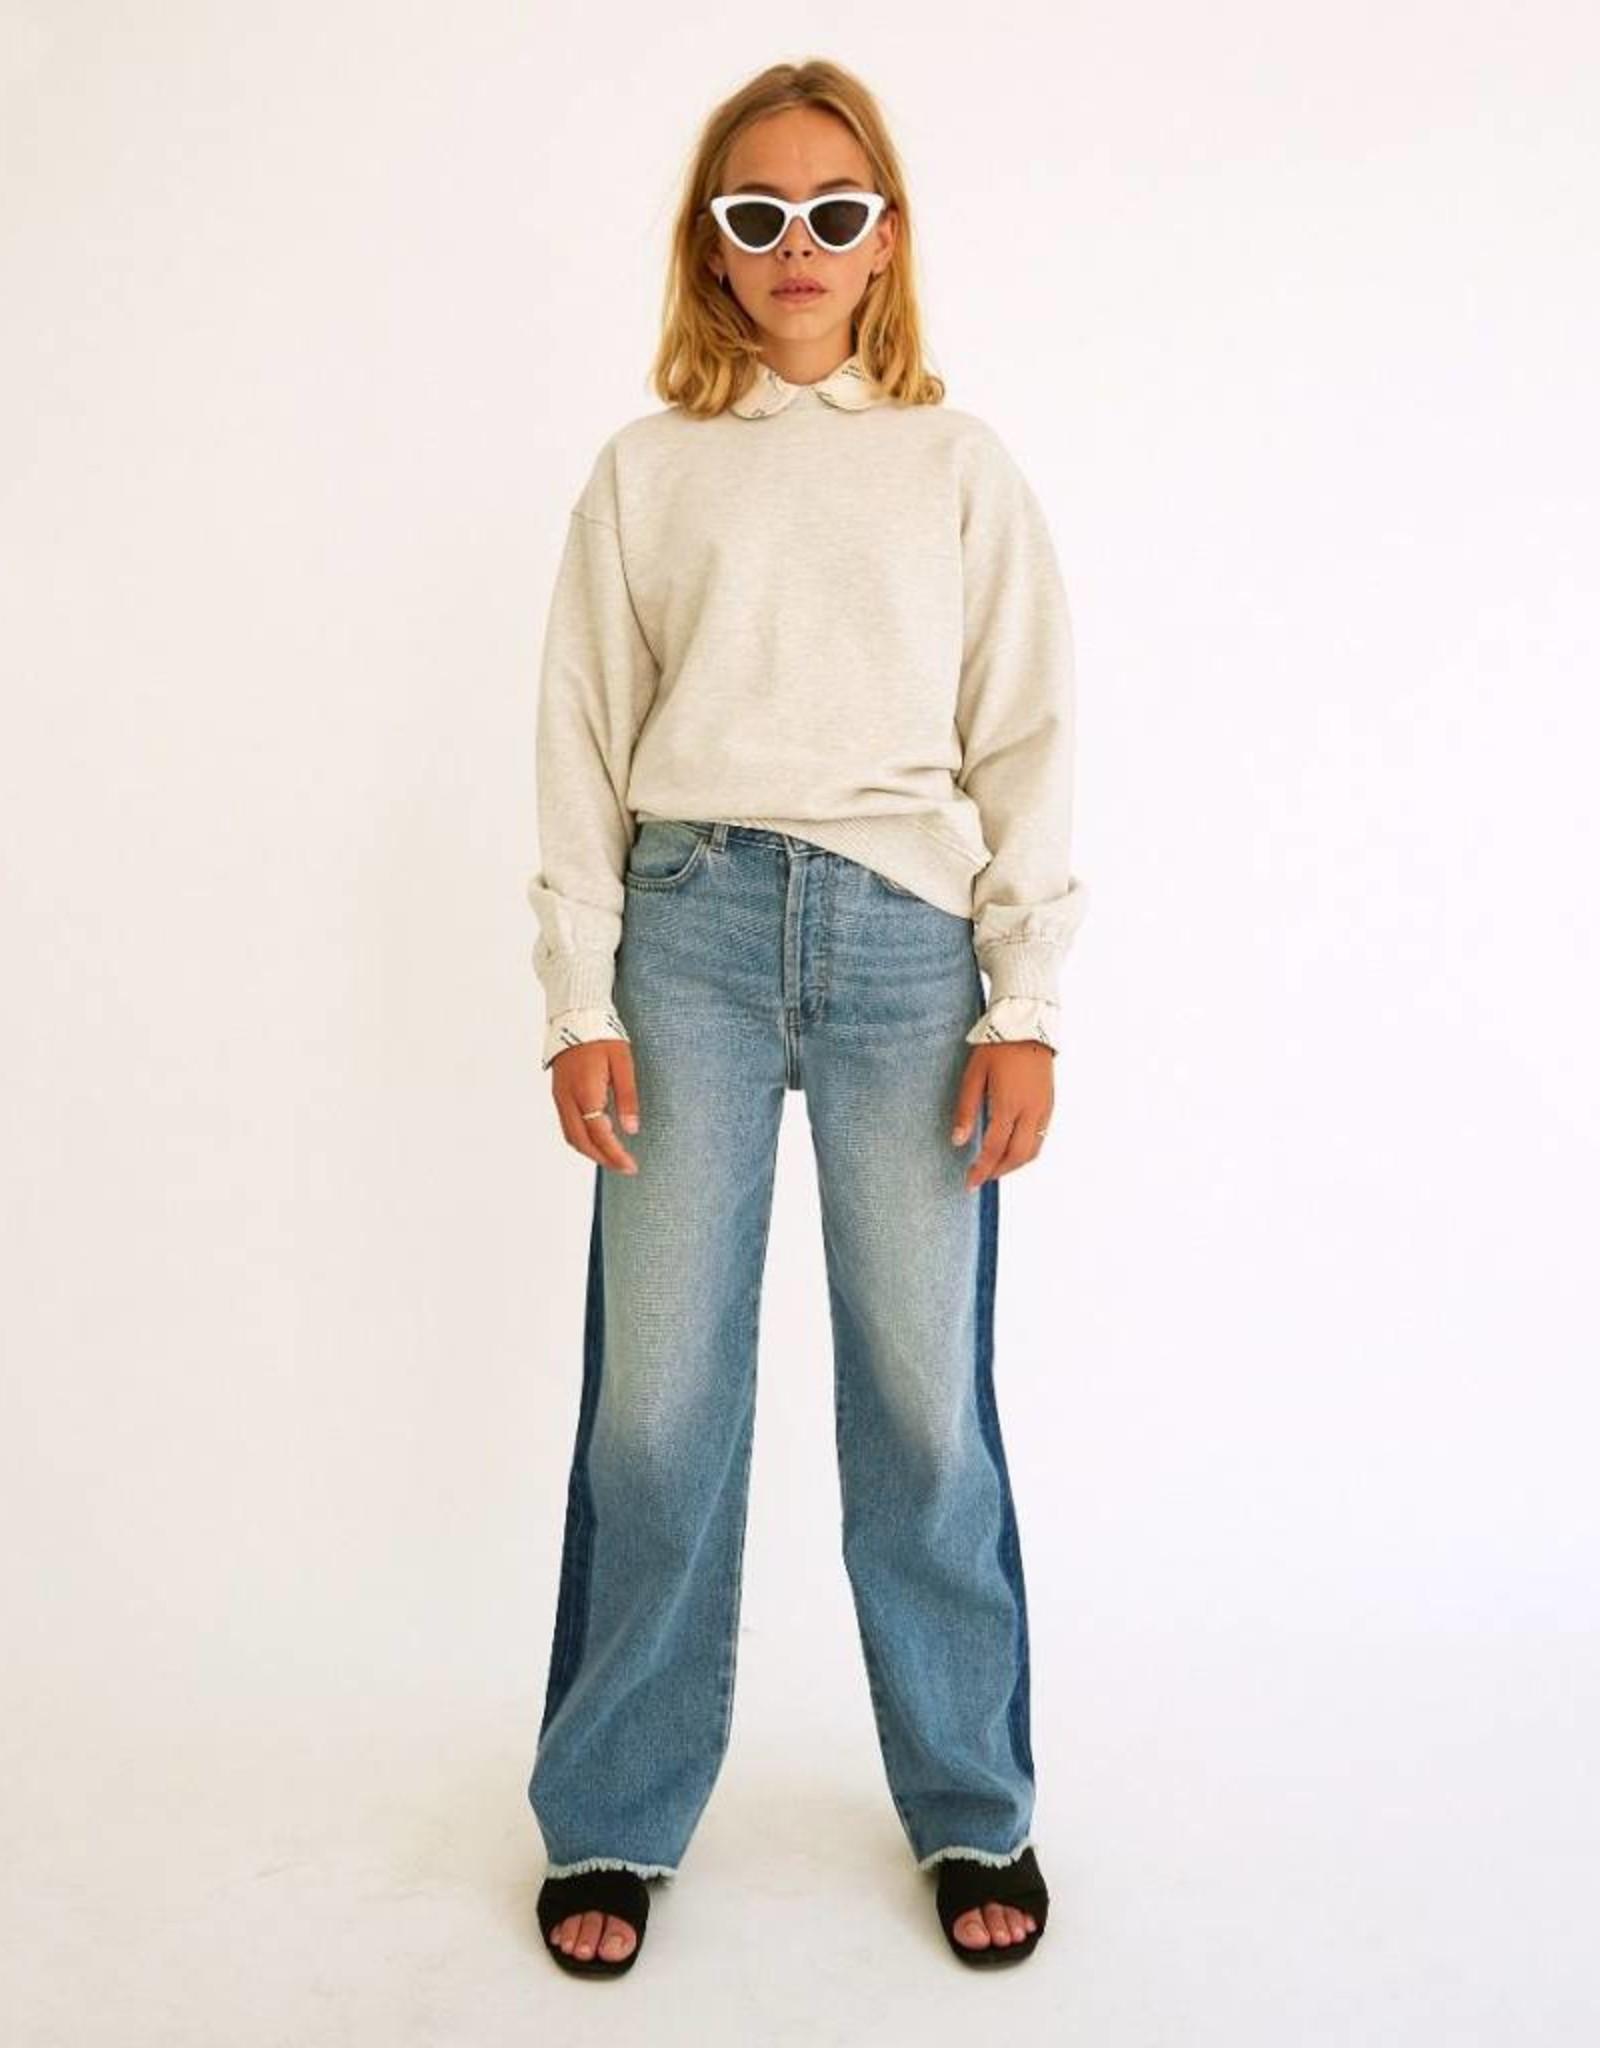 Viktoria sweatshirt